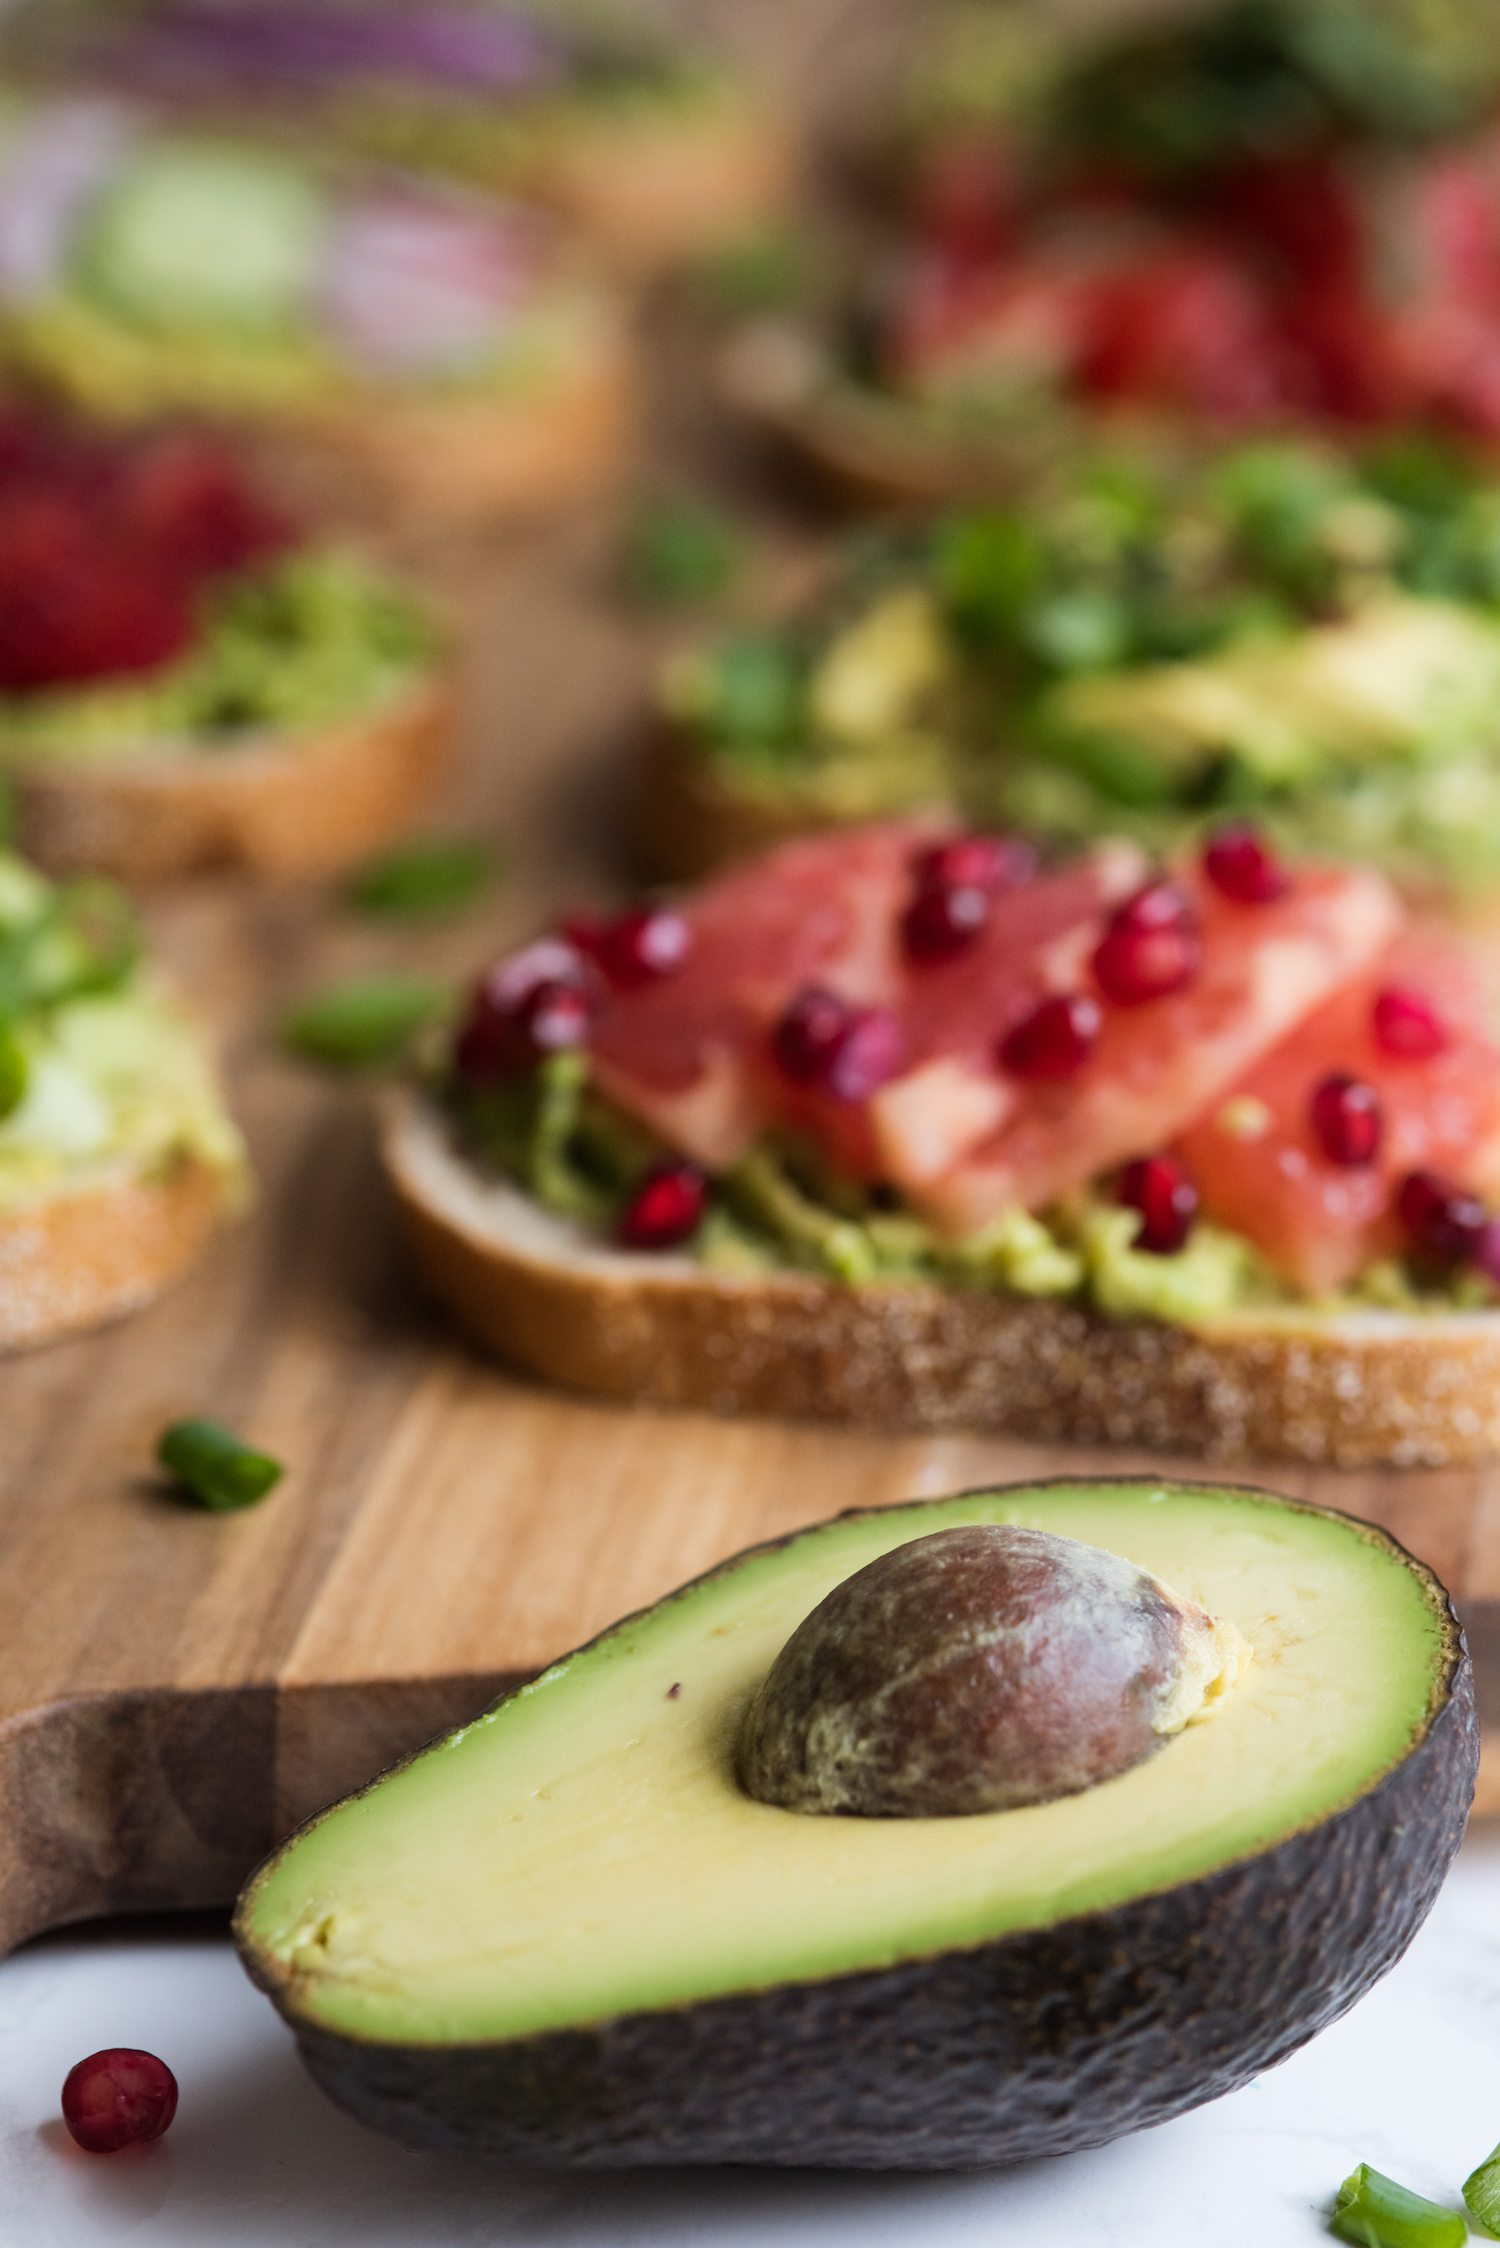 8 Awesome Ways to Make Avocado Toast | Unique avocado toast recipes, entertaining tips, party ideas and recipes from @cydconverse